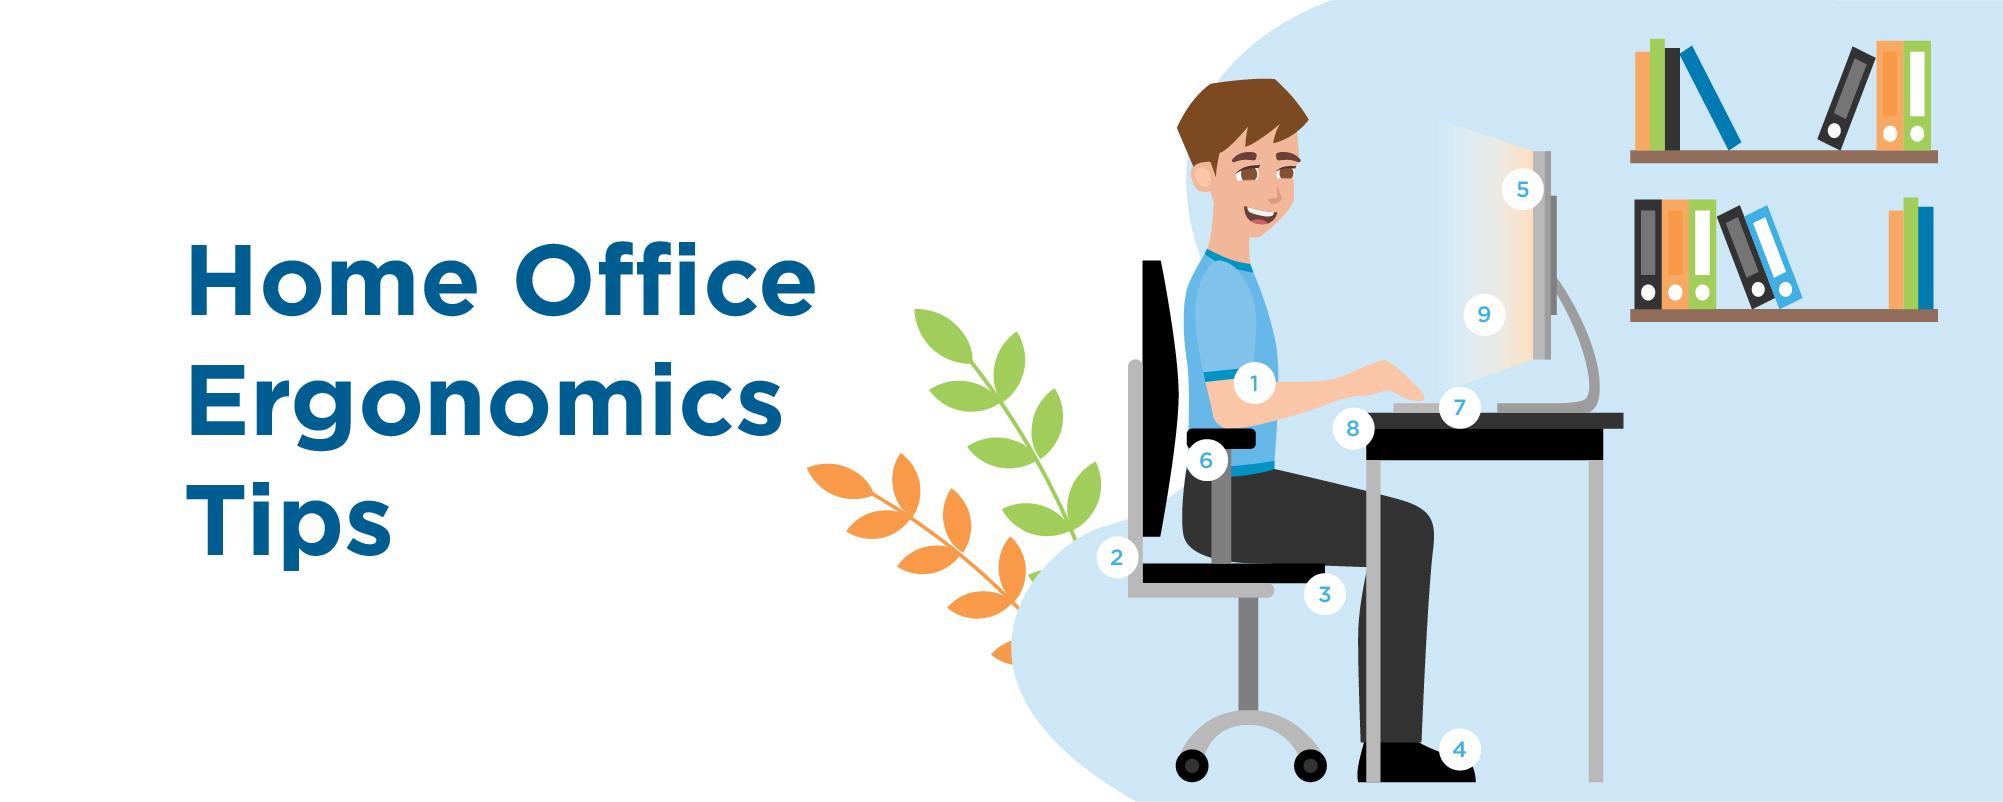 home office ergonomics tips